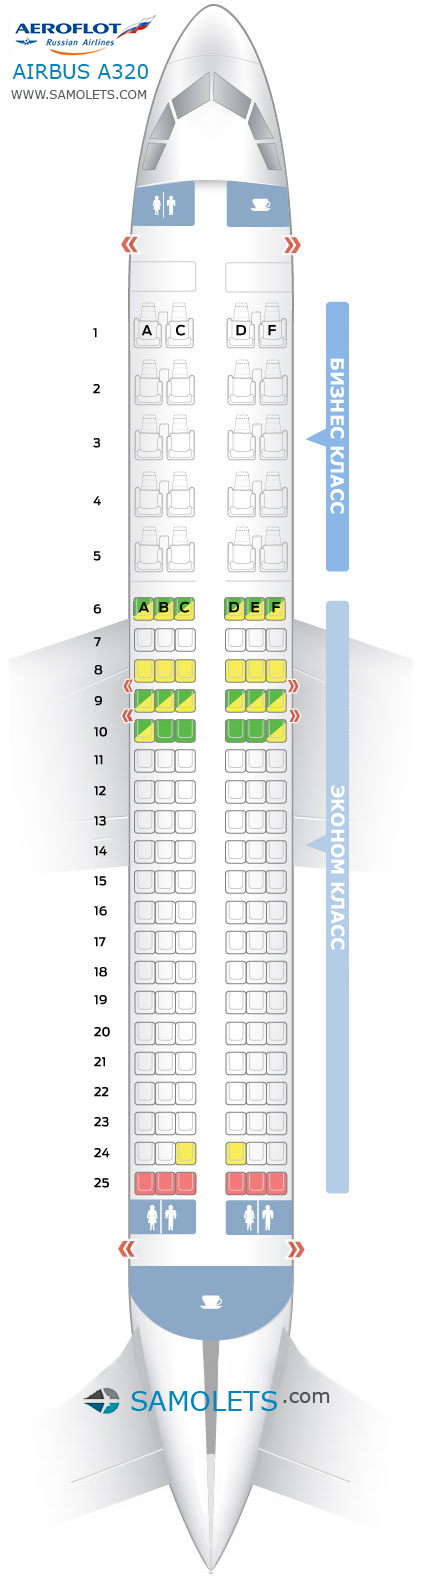 A320 схема салона лучшие места